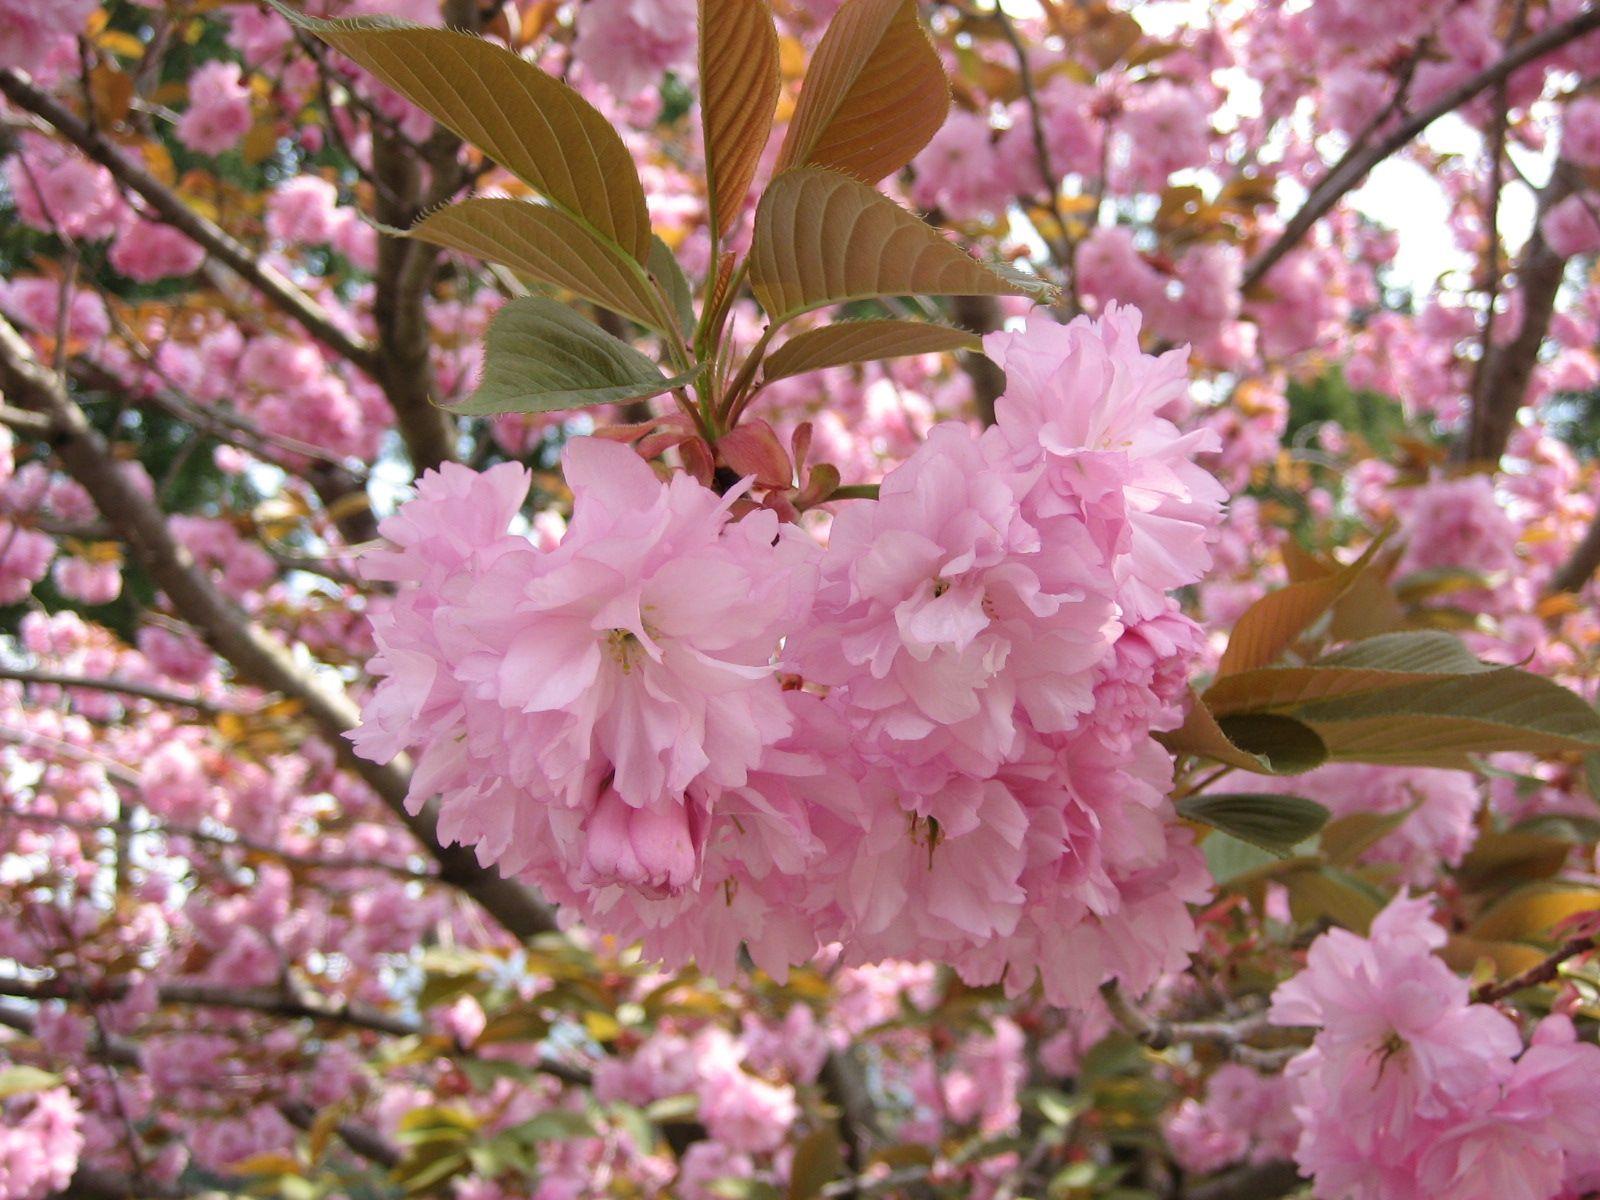 My Wagashi Chronicles Salt Preserved Cherry Leaves Cherry Leaf Wagashi Edible Flowers